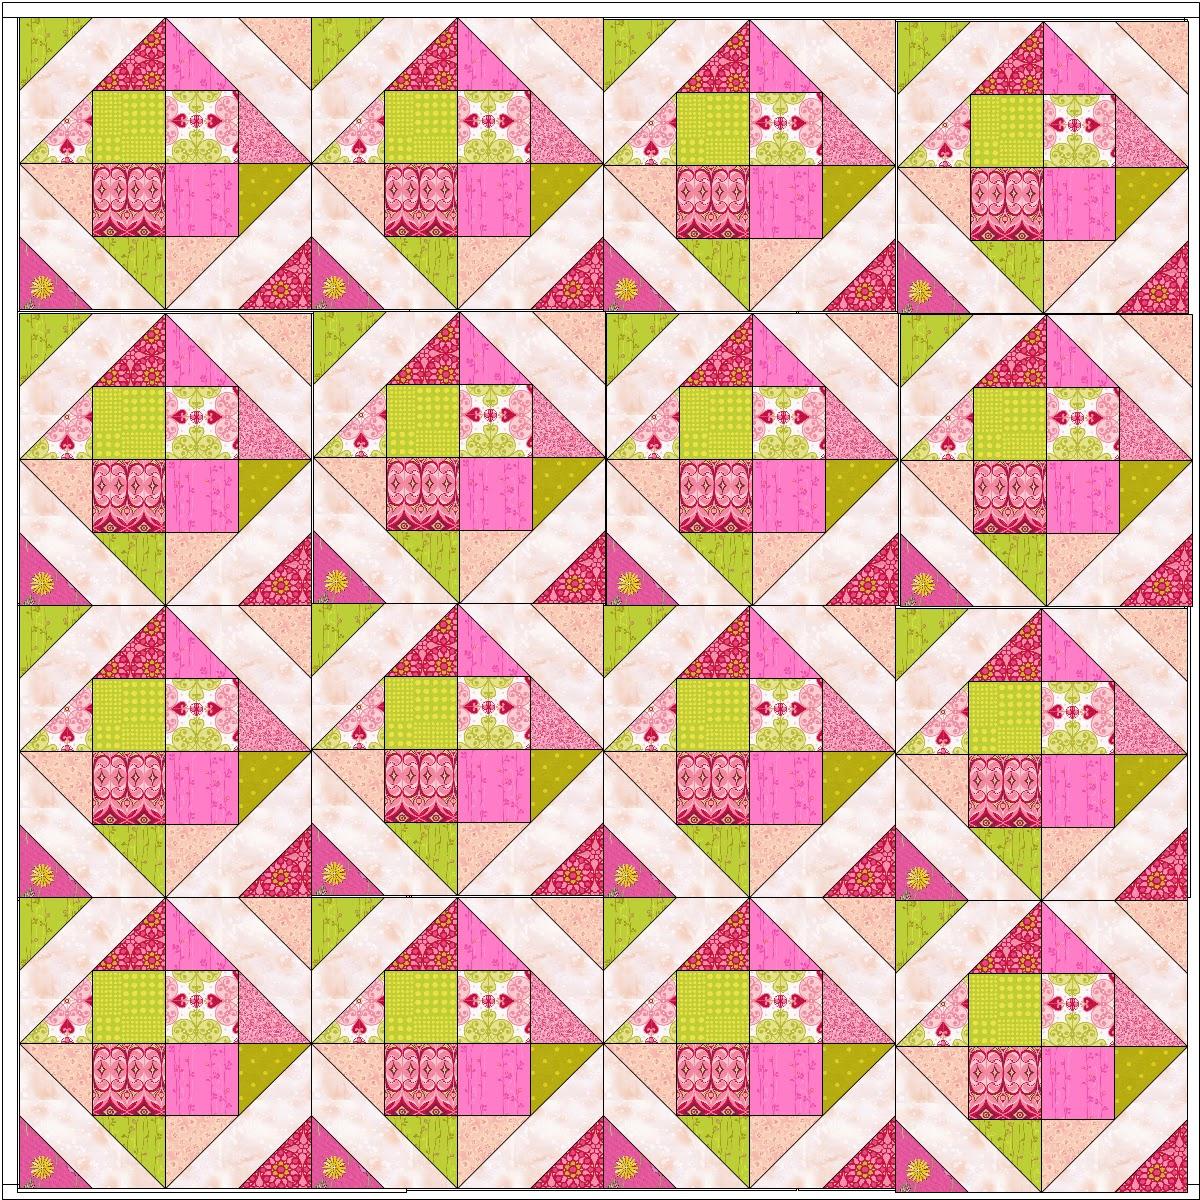 http://4.bp.blogspot.com/_9hzghShqAA0/TUgox8qk_VI/AAAAAAAAAxc/7IKdRoLJOaU/s1600/Variation+Green+and+Pink.BMP